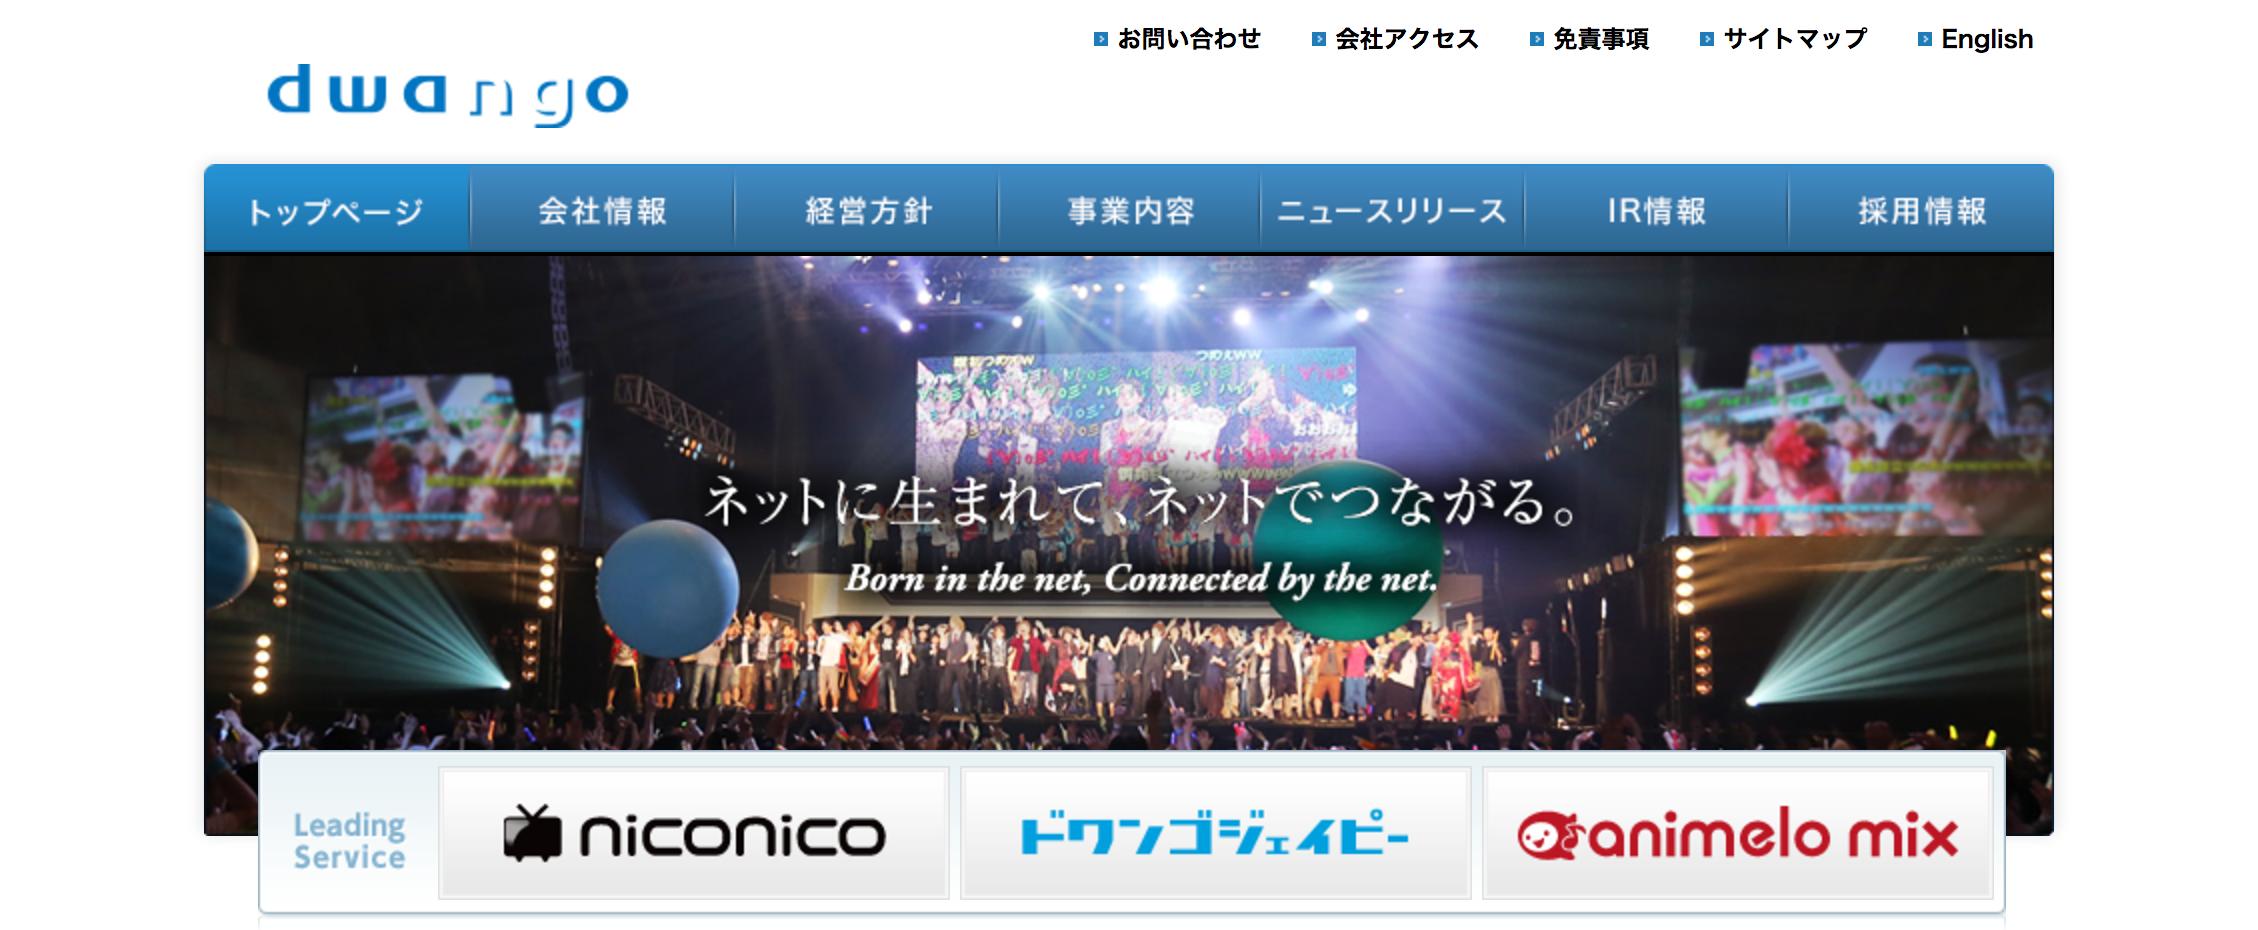 FireShot Capture 279 - 株式会社ドワンゴ - http___dwango.co.jp_